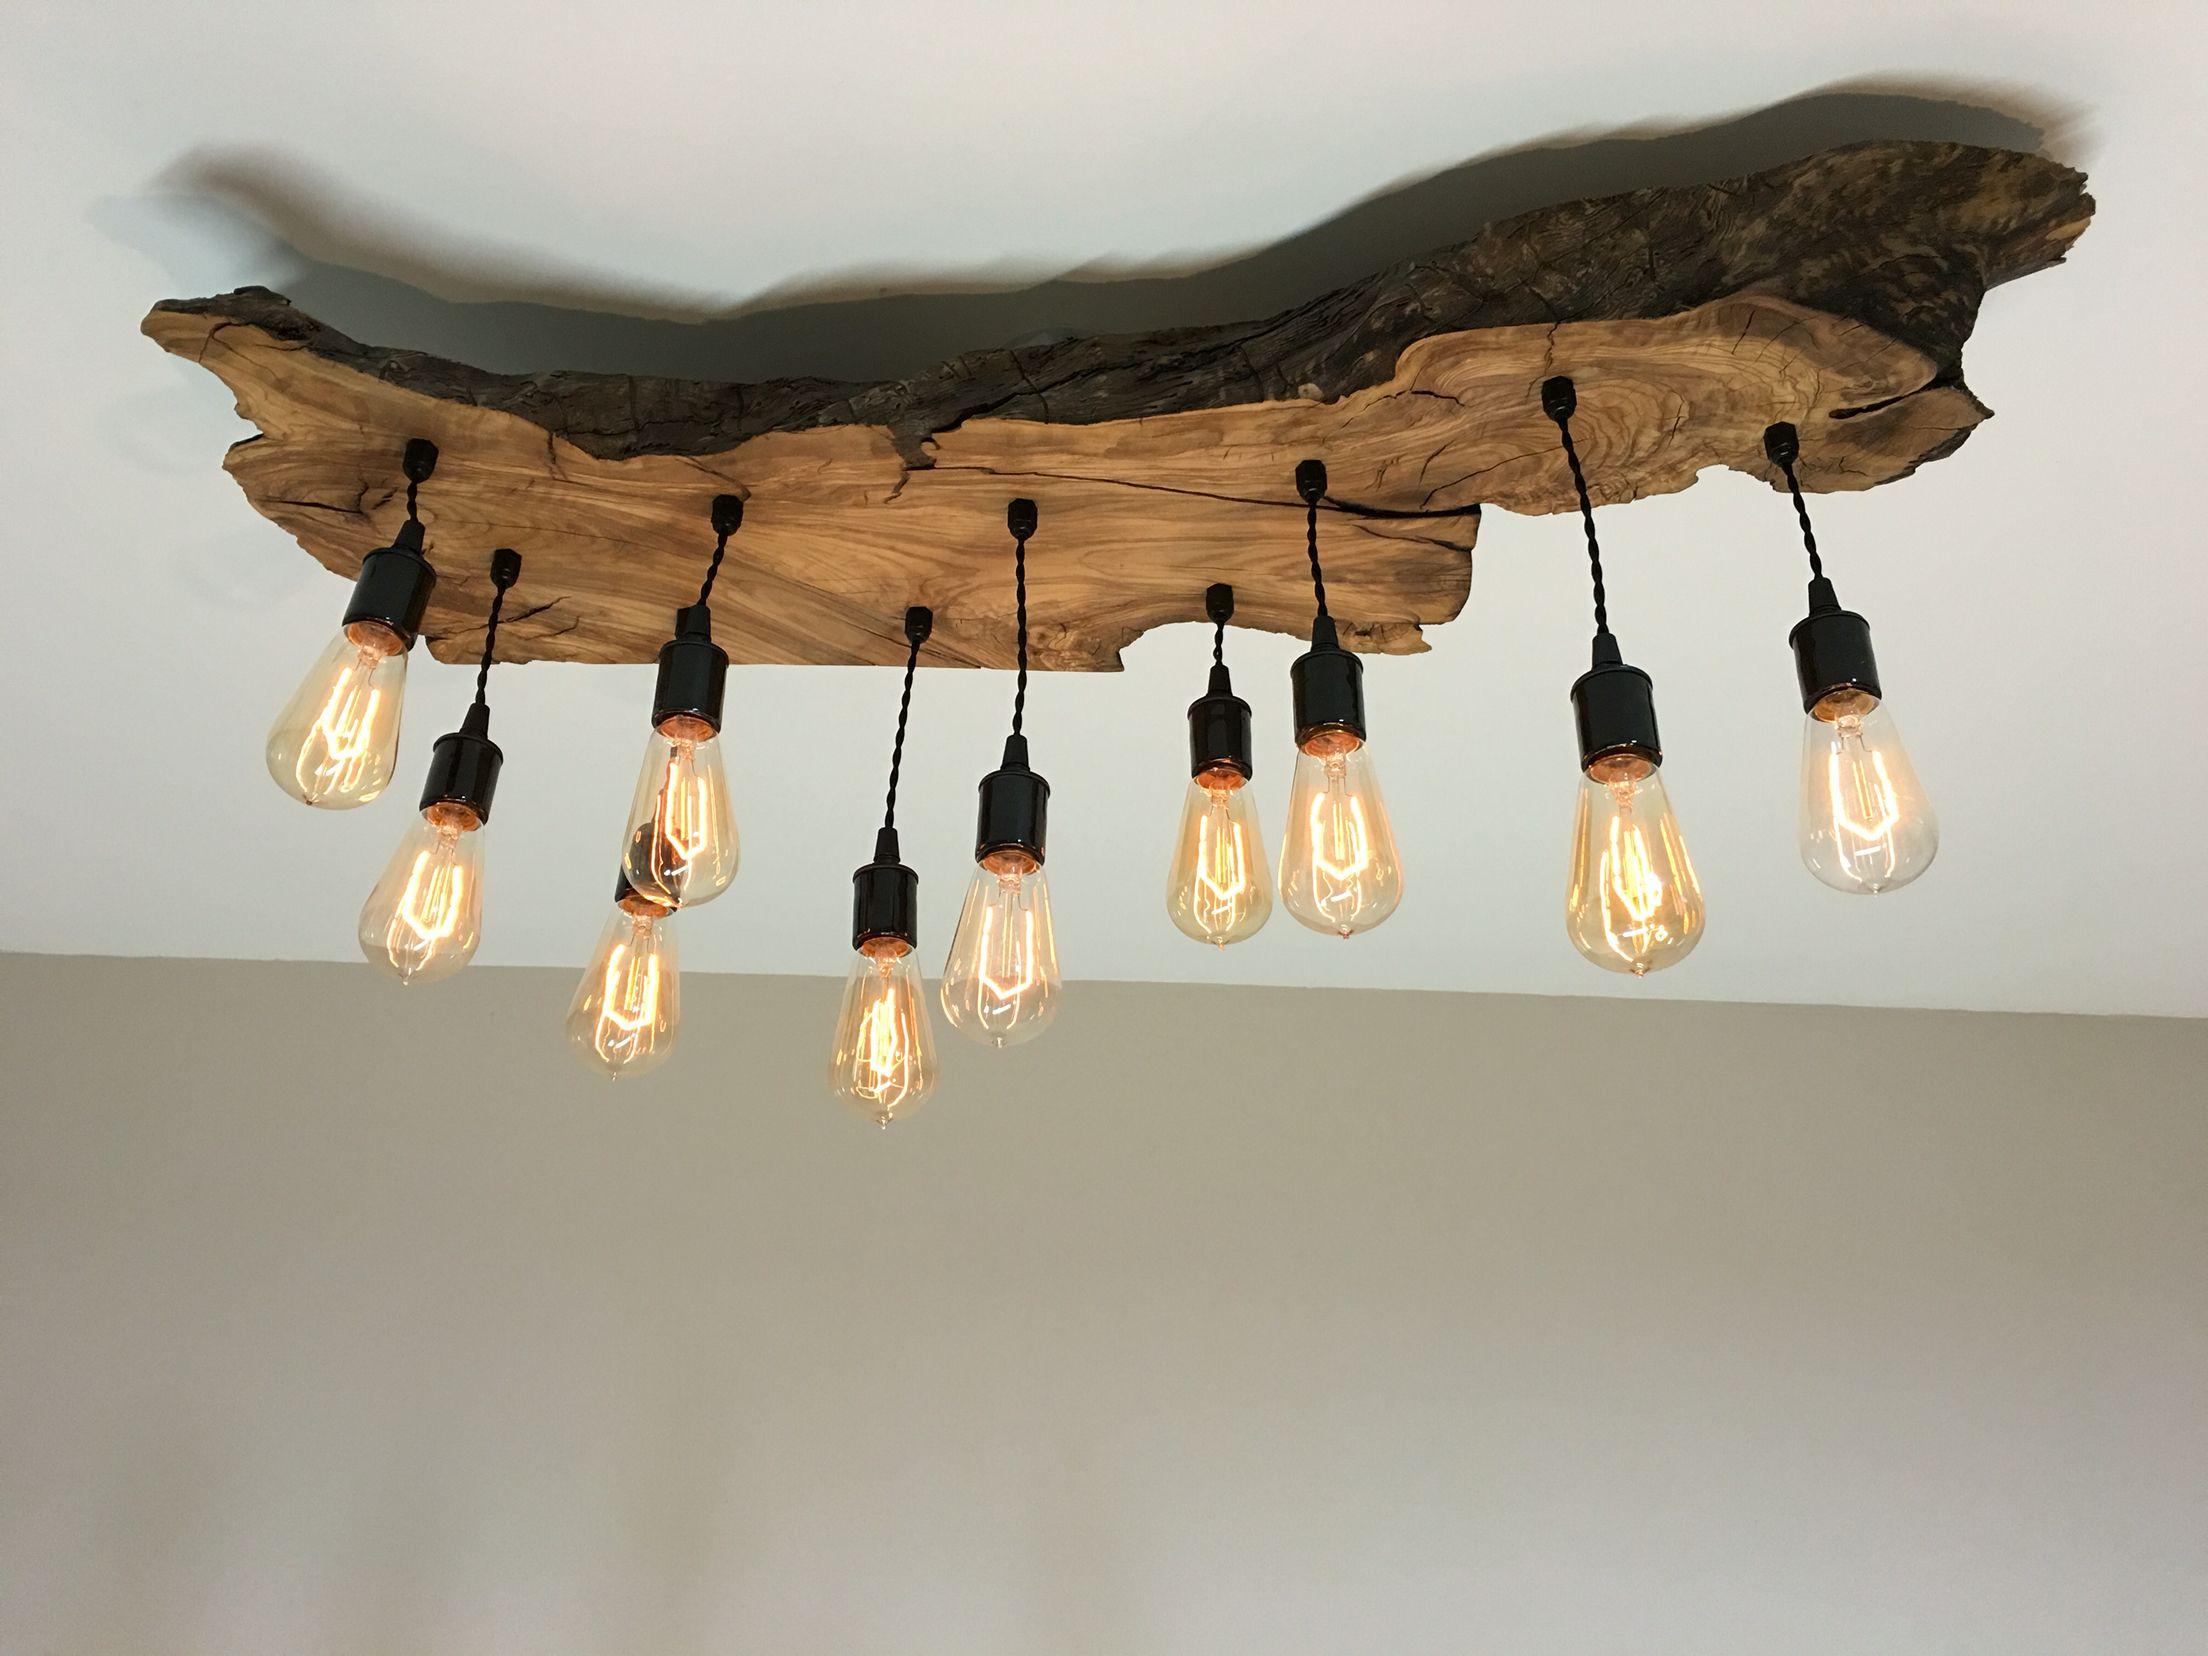 rustic modern lighting. olive wood chandelier woodworking design lighting interiordesign industrialdesign rustic lightingmodern modern u